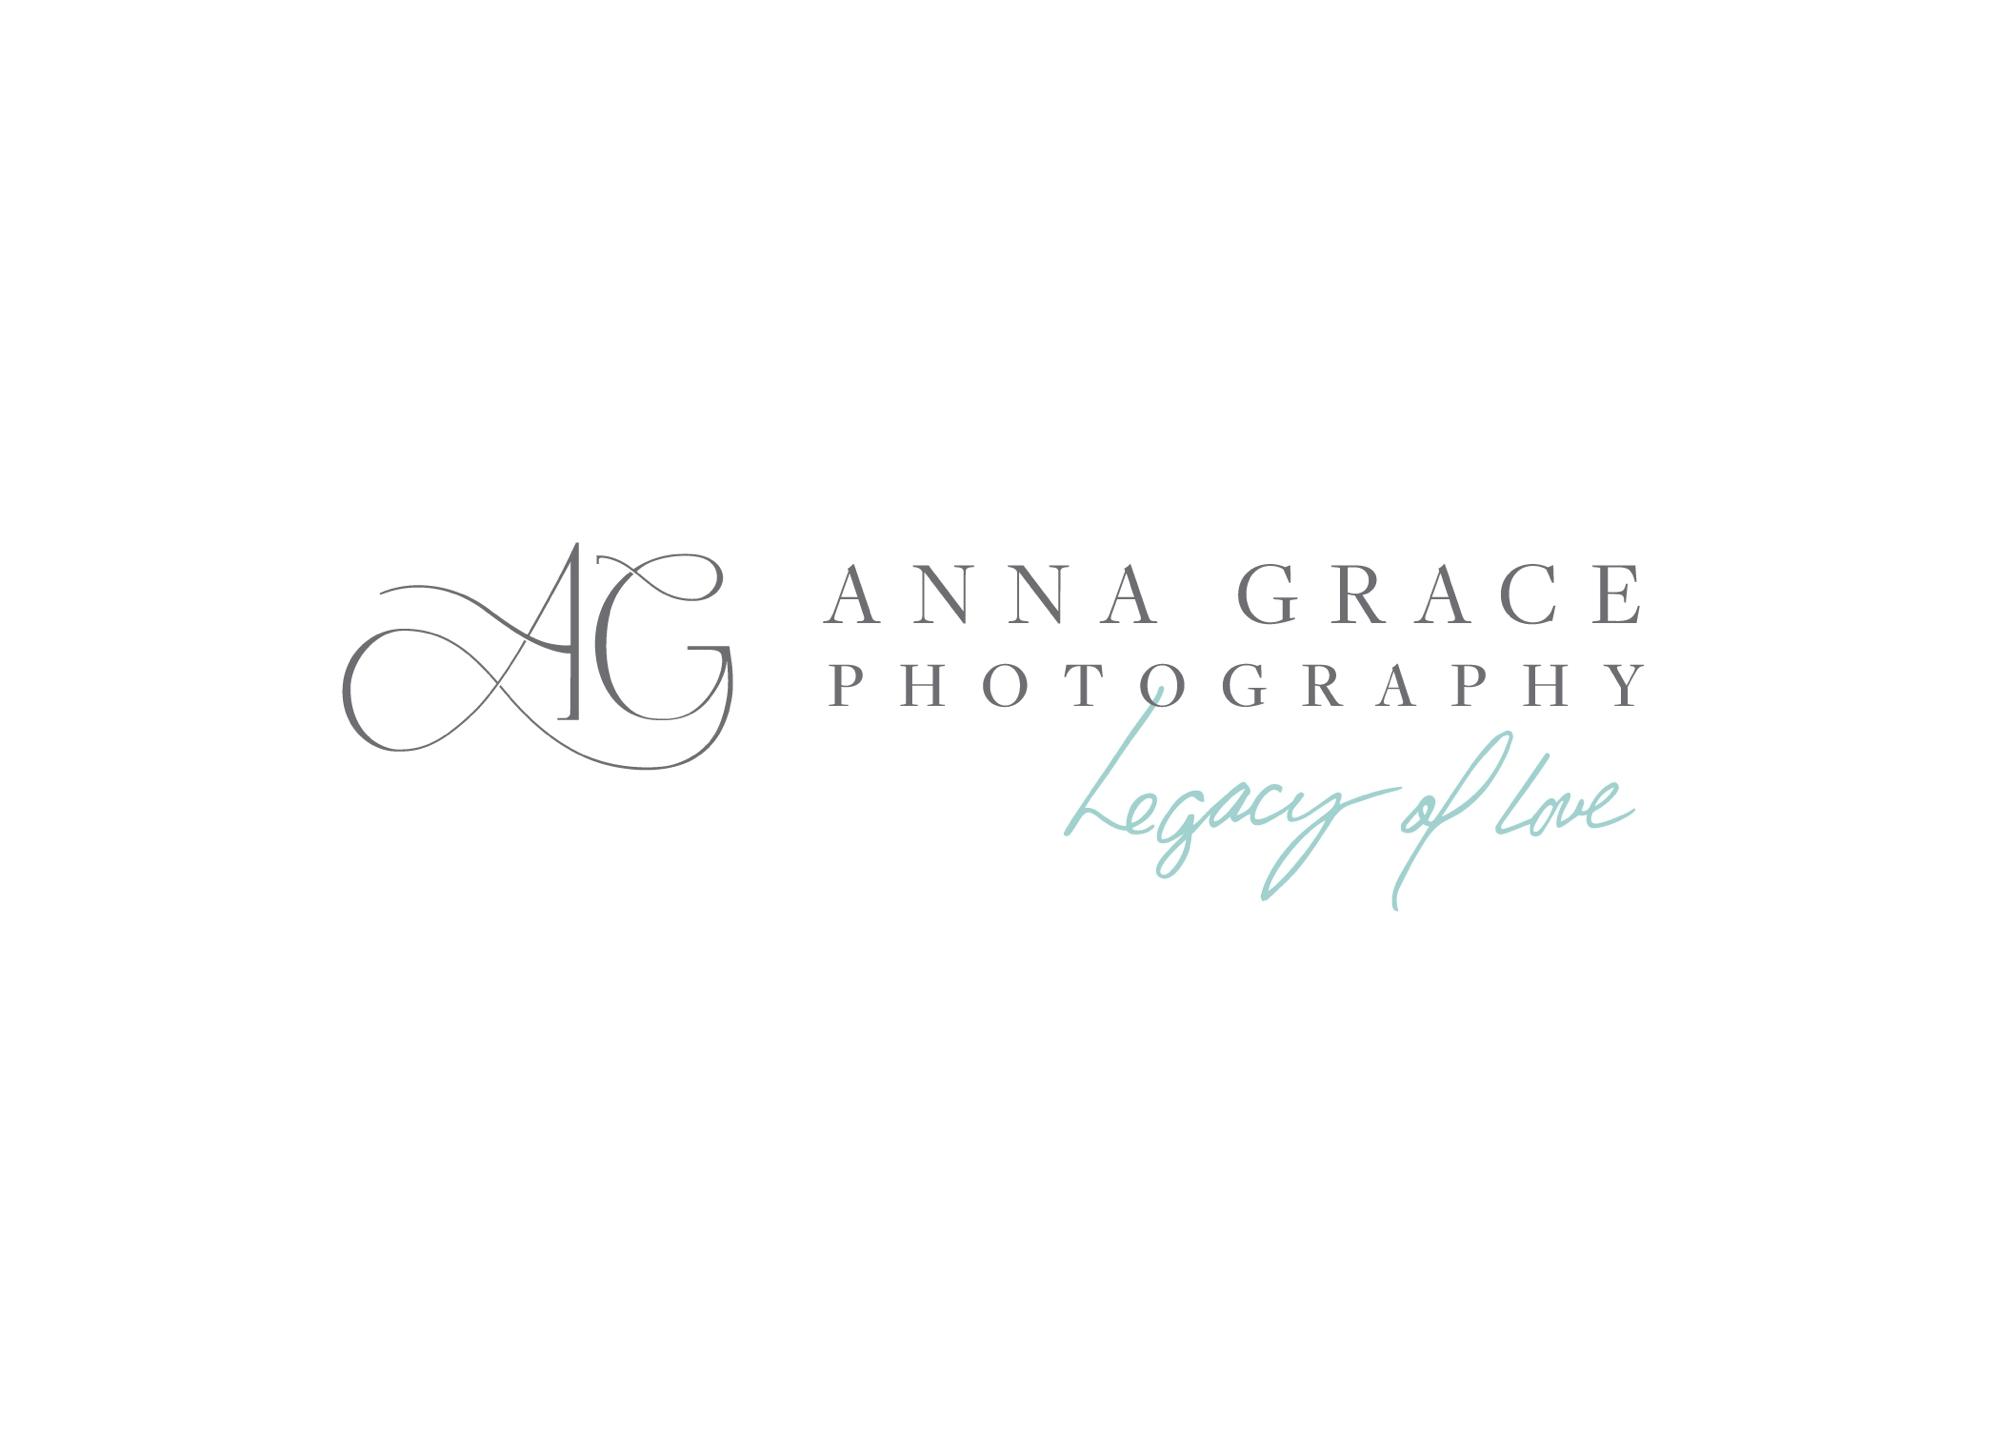 AGP Logo Concepts PB&J ROUND2-03_anna grace photography maryland newborn photographer photo.jpg